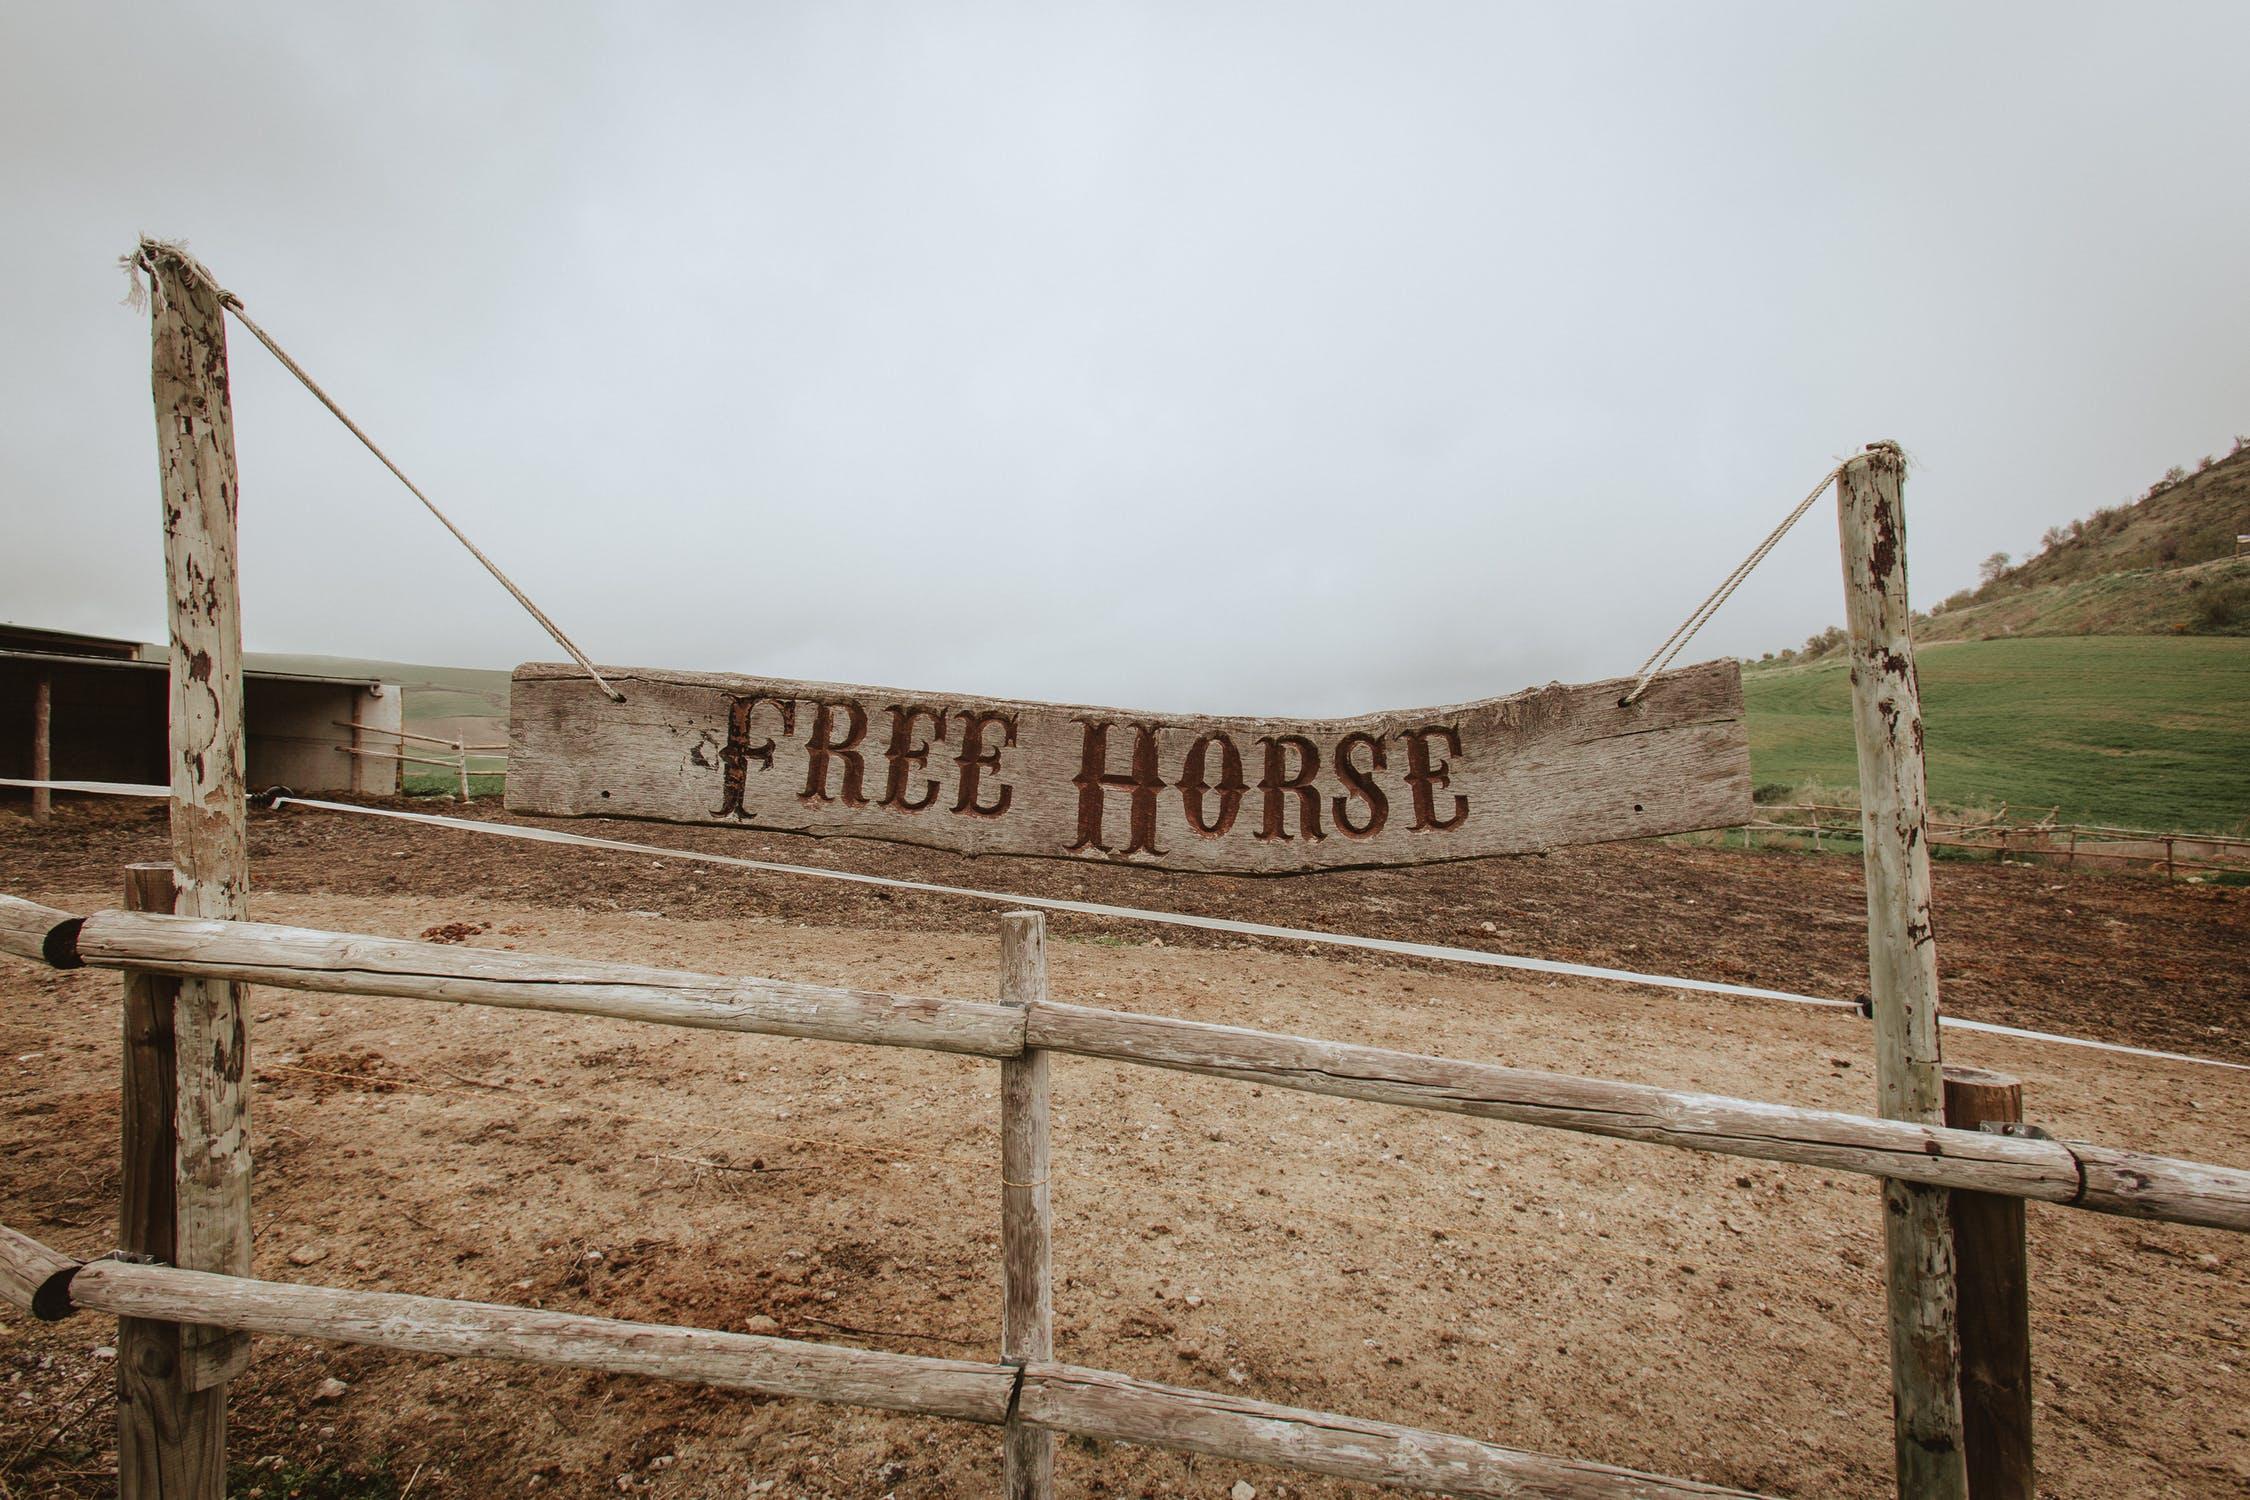 free horse, free horse